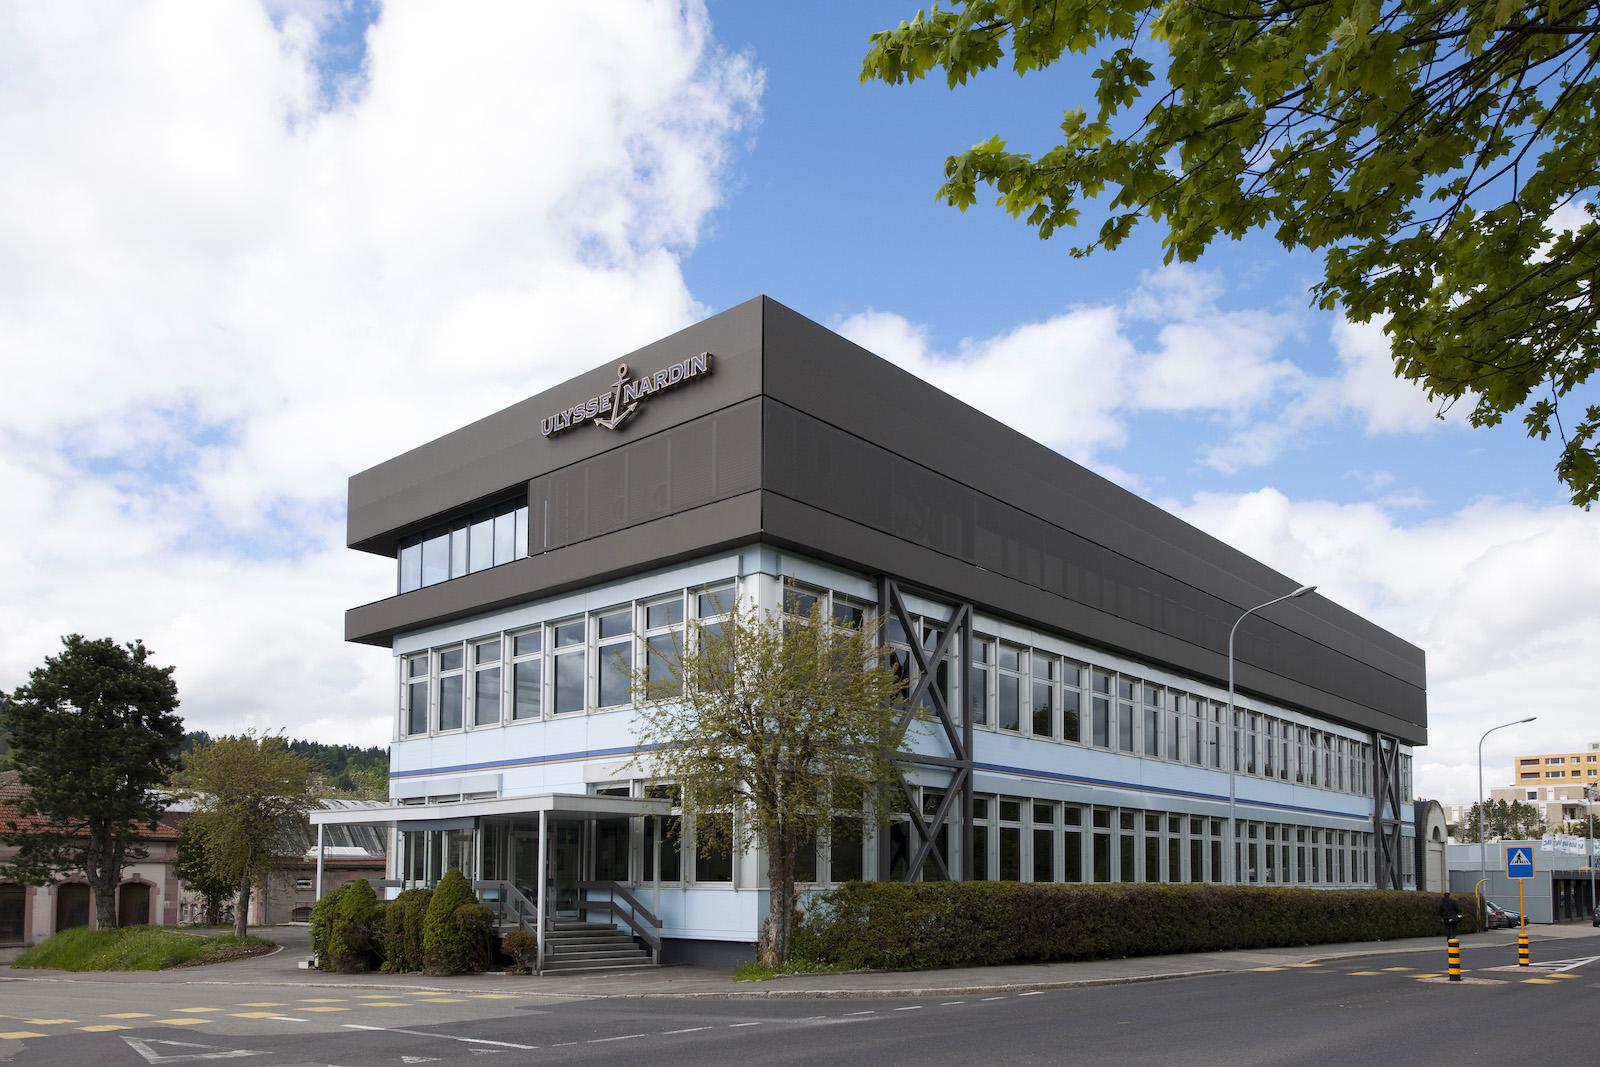 manufactura-ulysse-nardin-lachaux-de-fonds